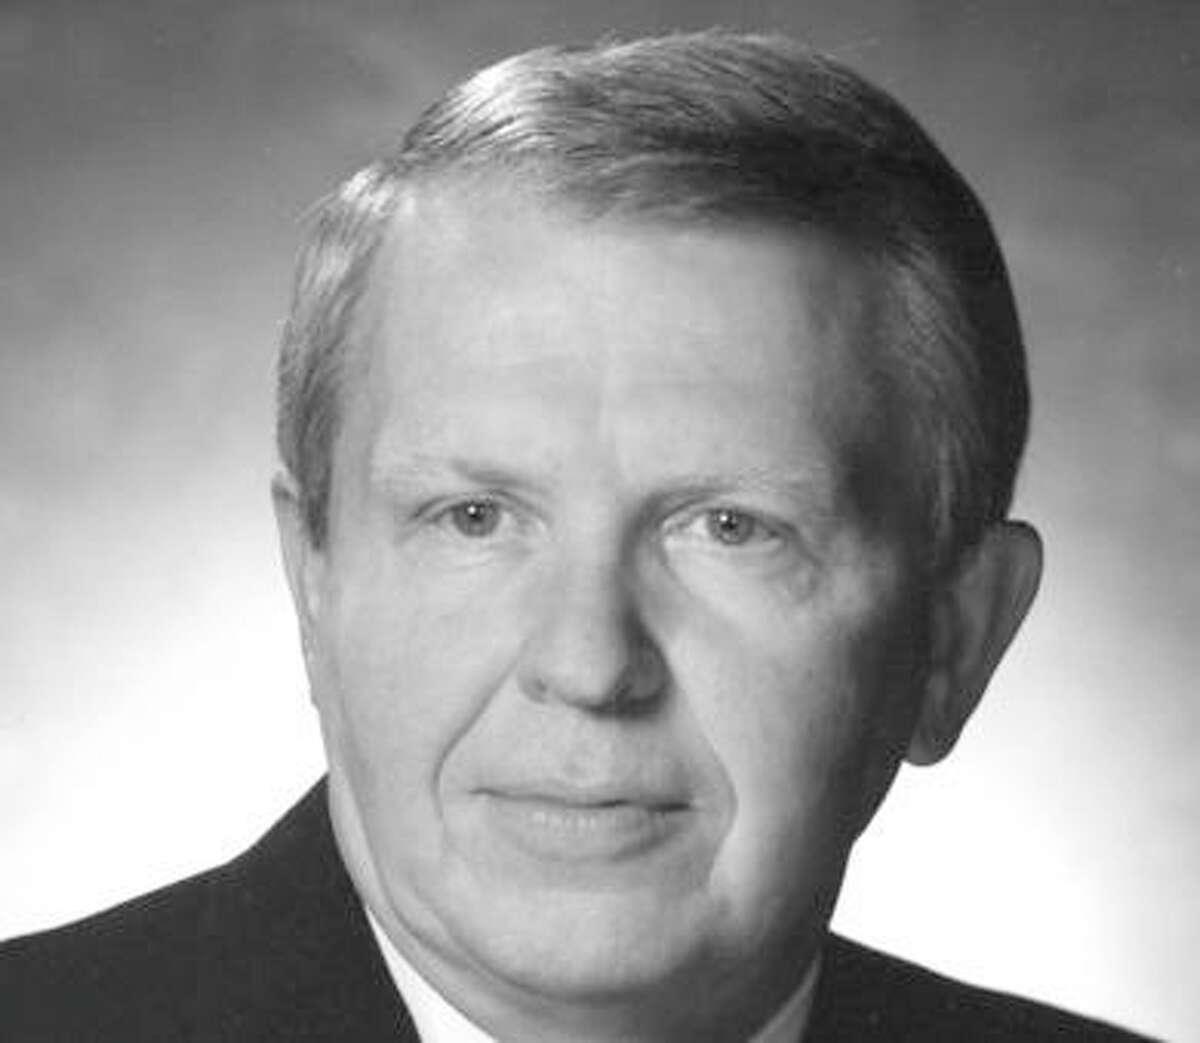 Former Spring ISD Superintendent Gordon M. Anderson.